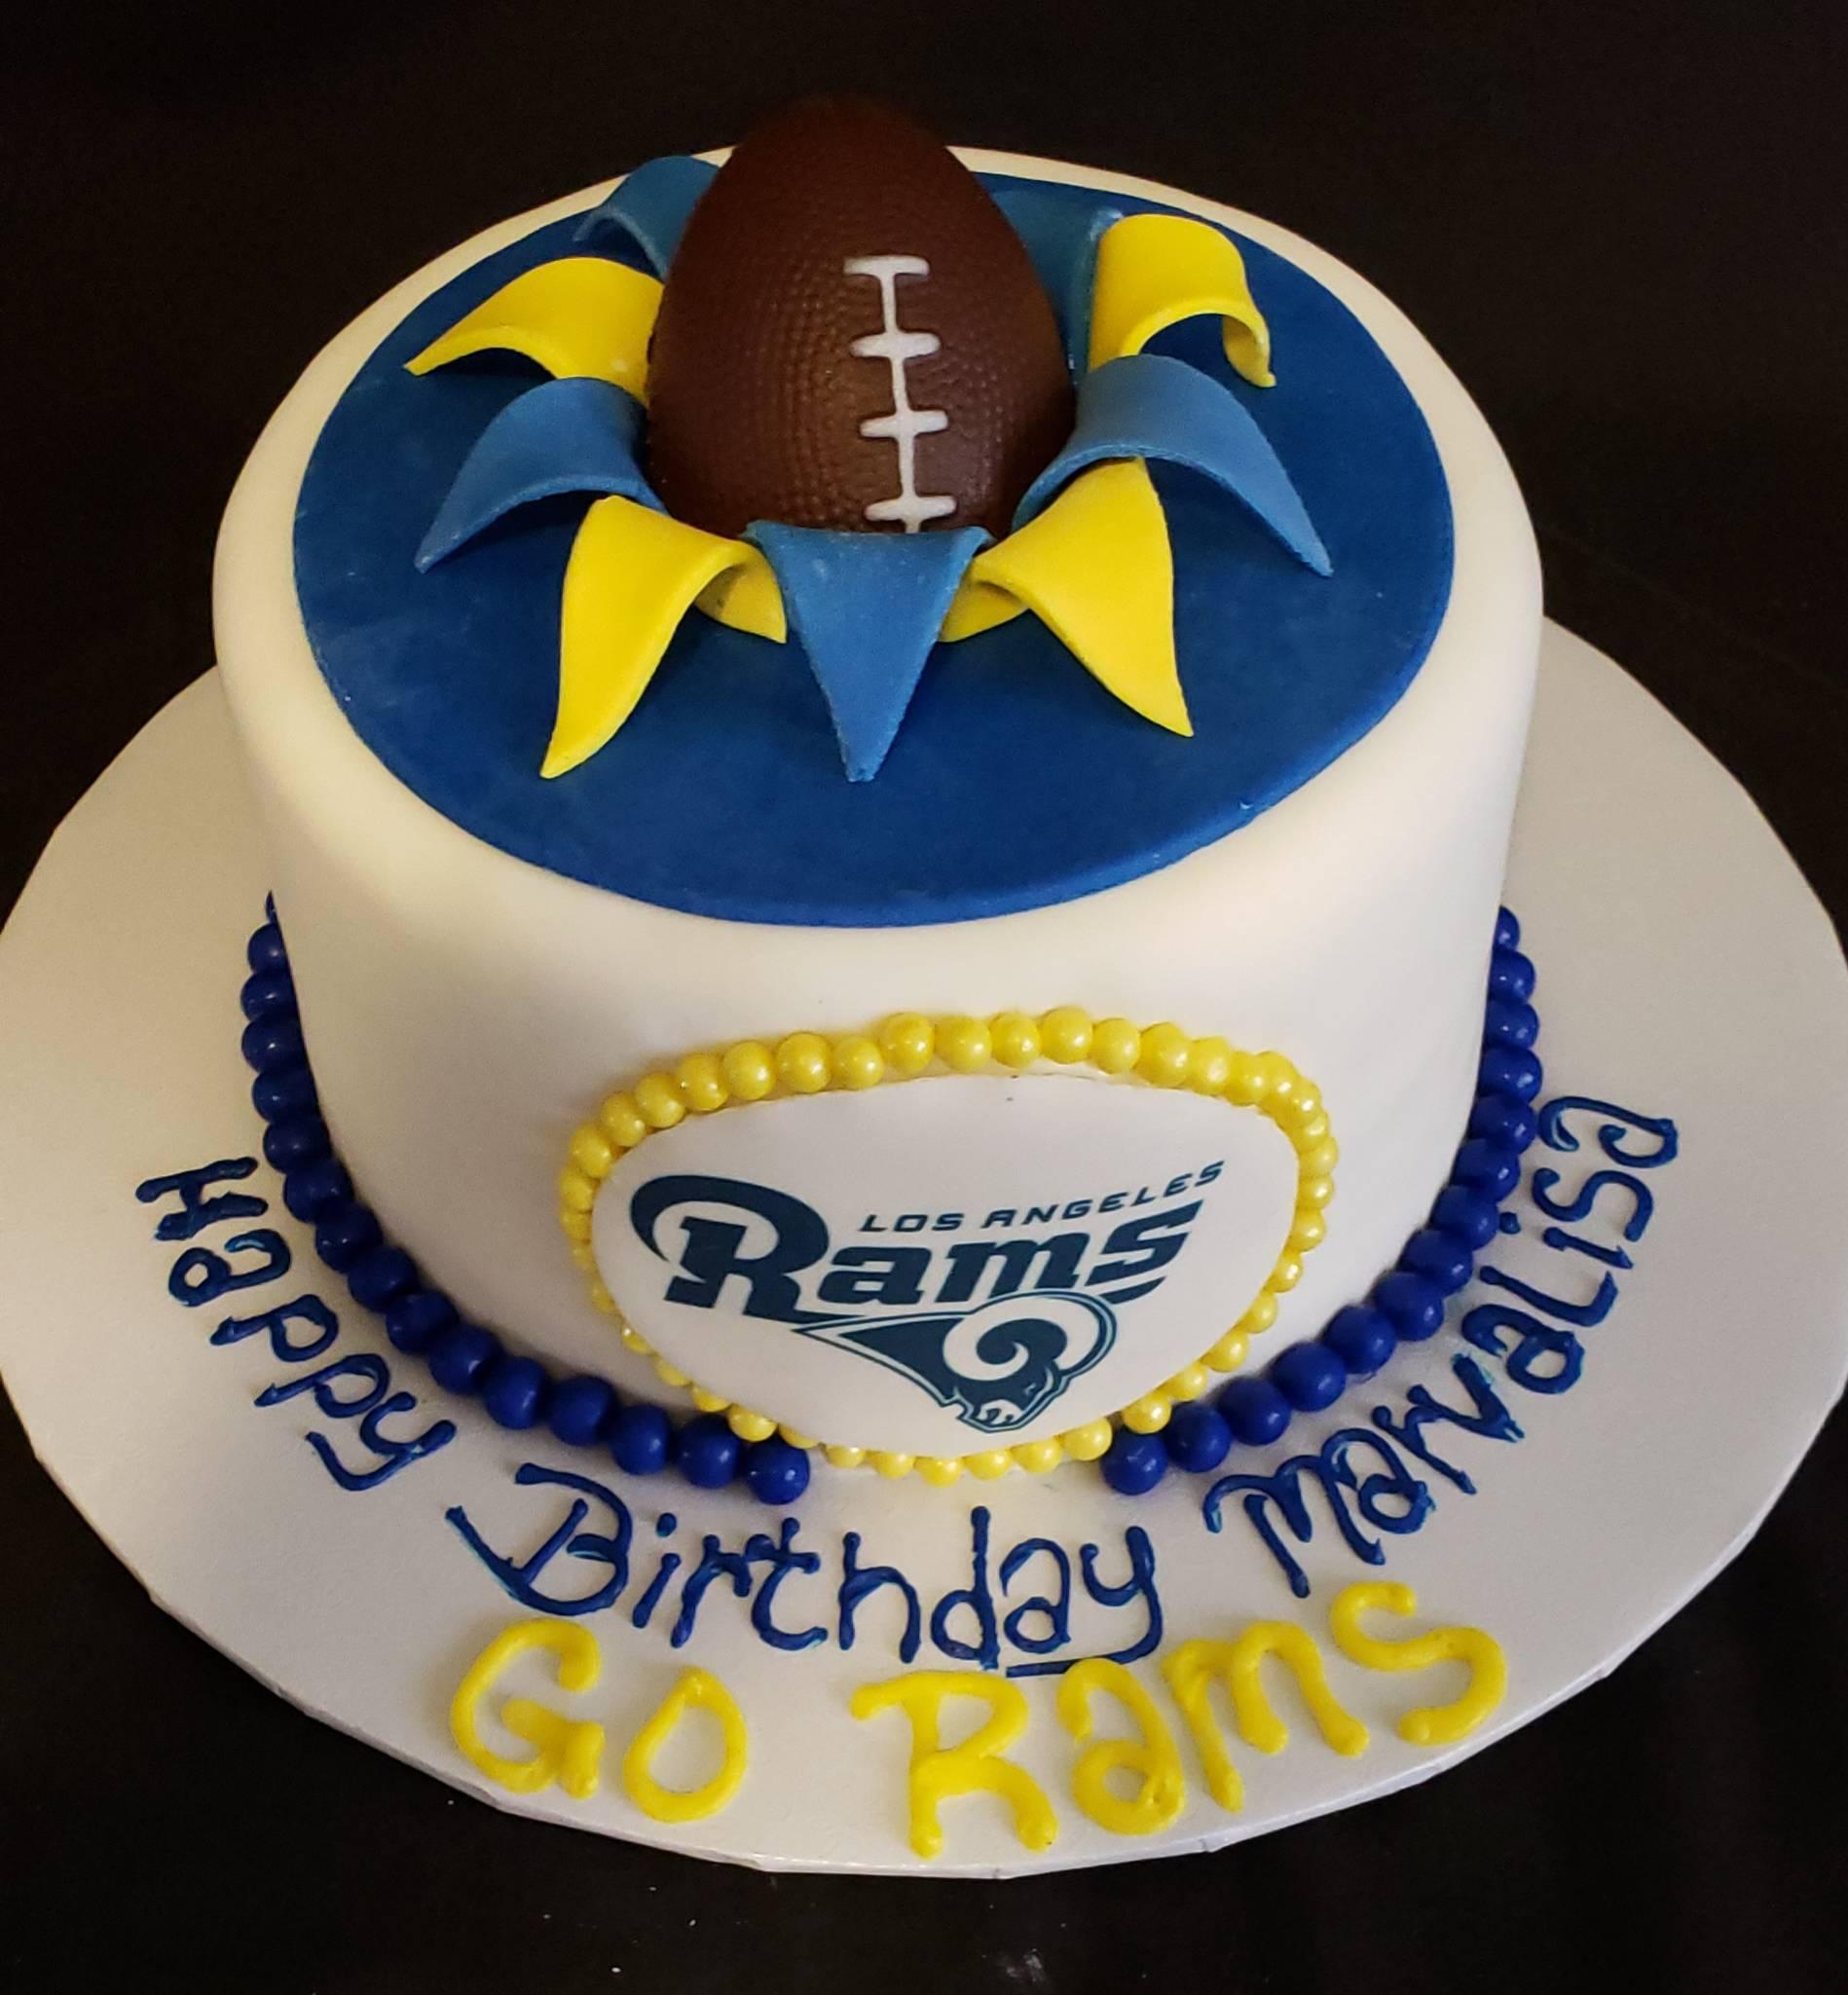 Los Angeles Rams Cake